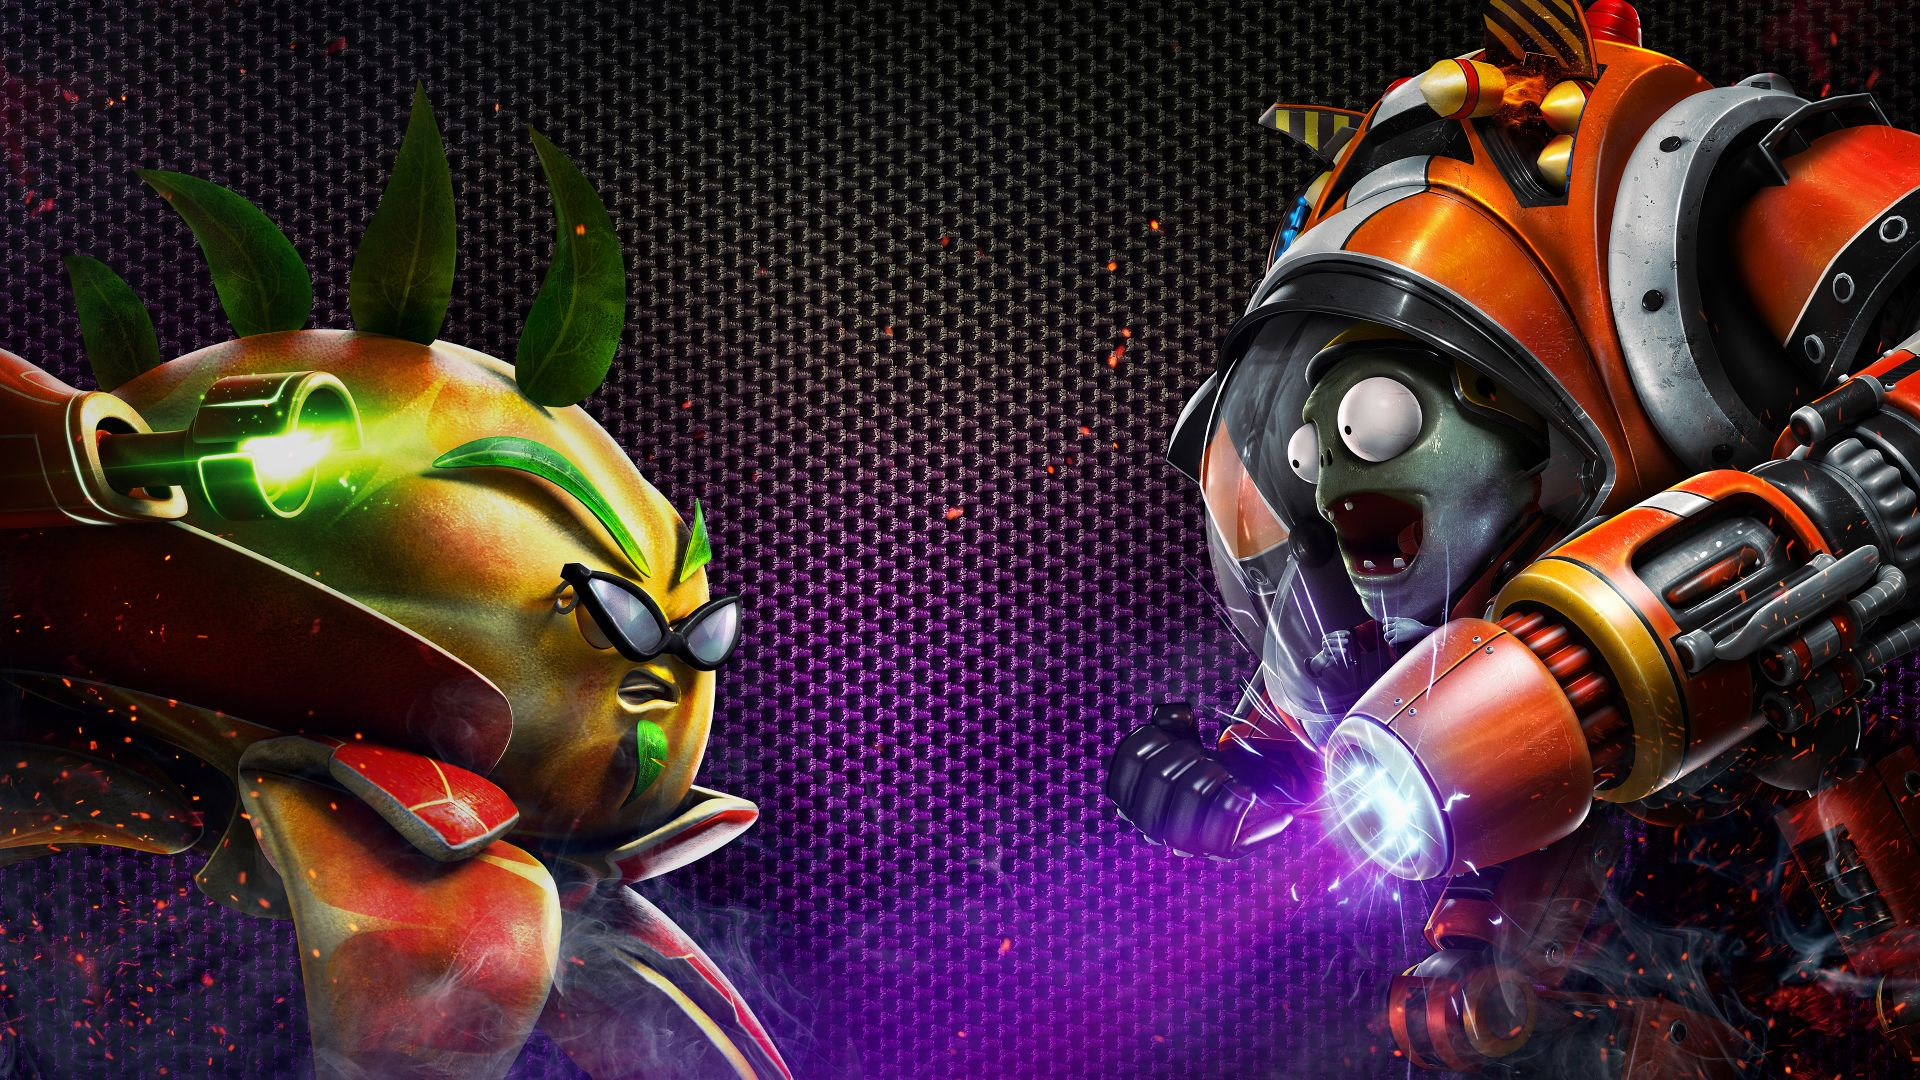 Plants Vs Zombies Garden Warfare 2 Festive Edition Upgrade For